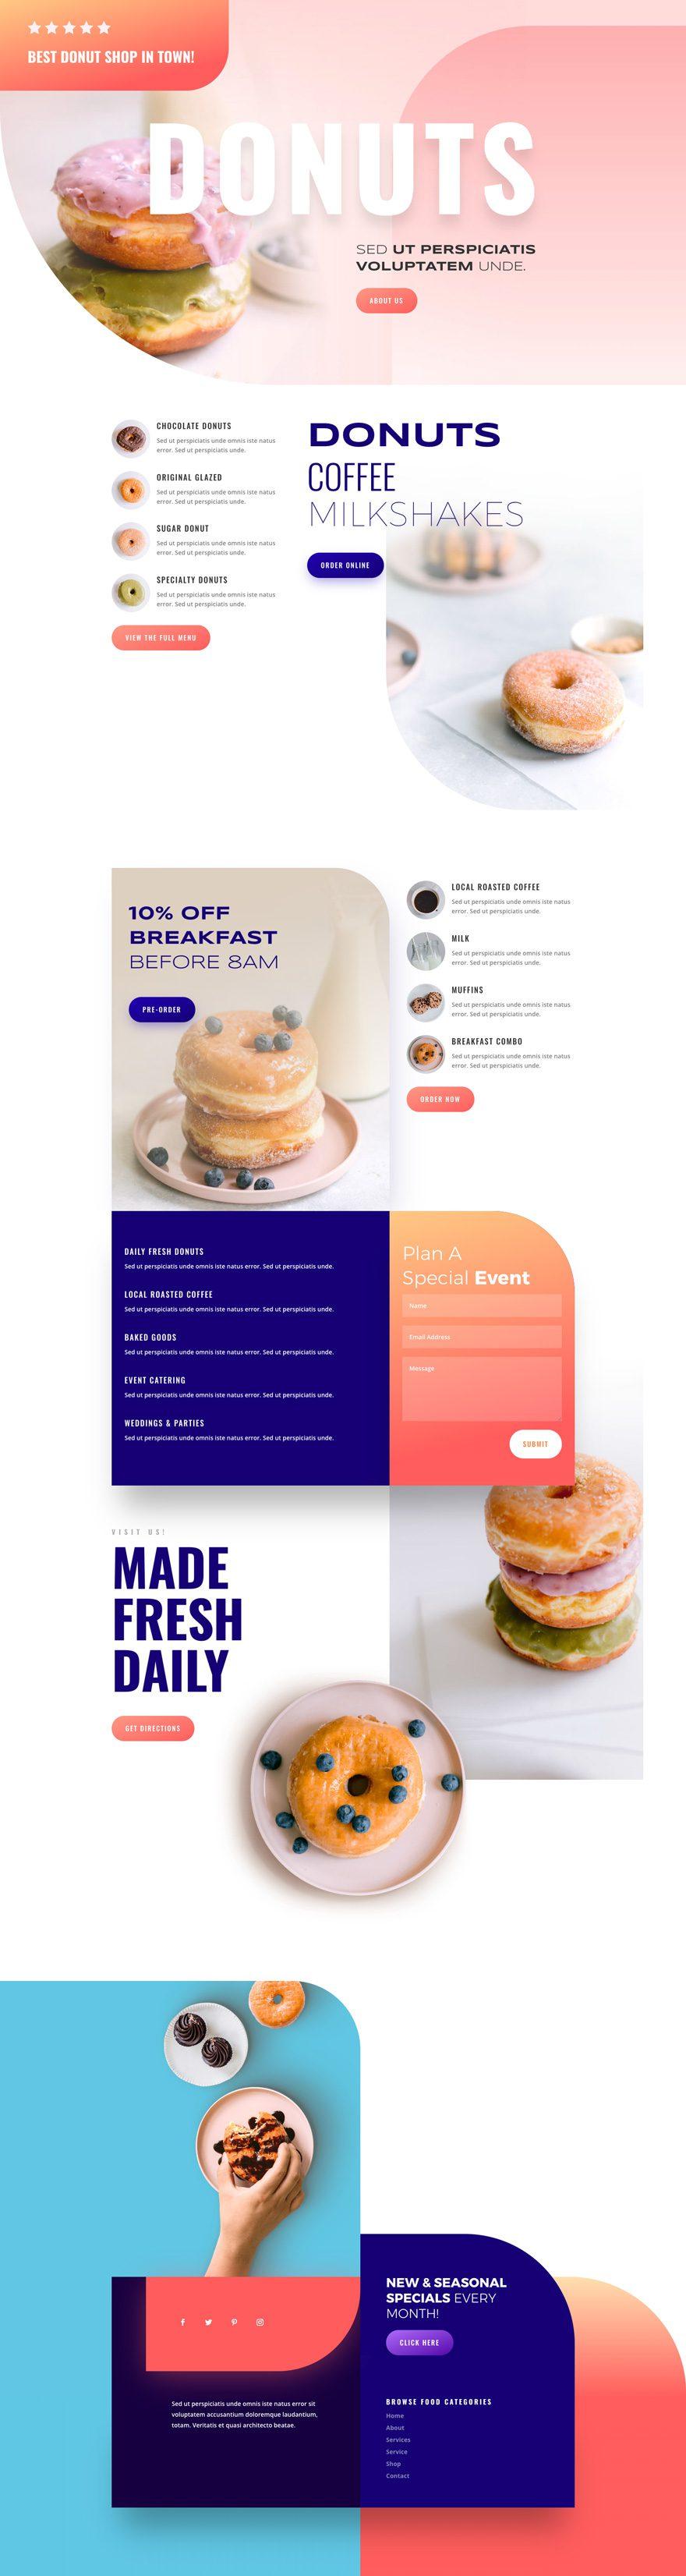 divi donut shop layout pack